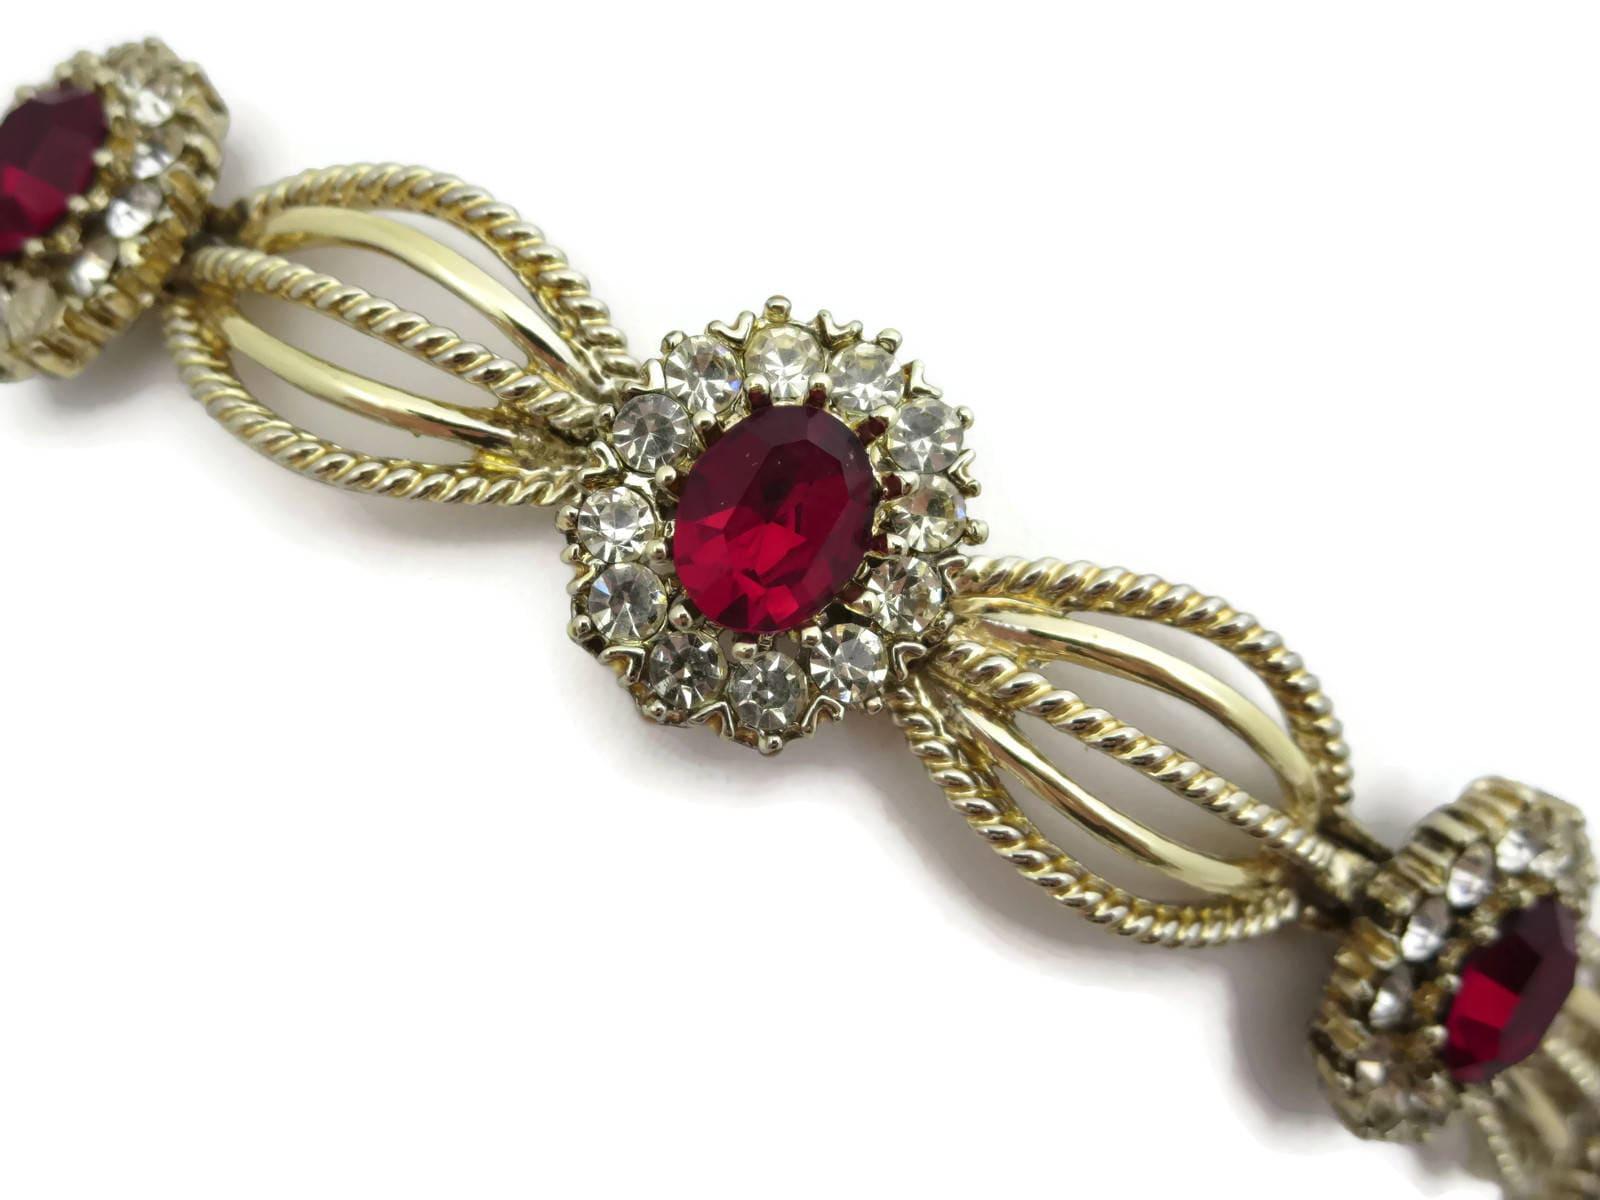 Coro Rhinestone Bracelet - Vintage Ruby Red Rhinestones Costume Jewelry  sc 1 st  Get Trendy Fashion Men u0026 Women online Furniture Bedding Jewelry ... & Coro Rhinestone Bracelet - Vintage Ruby Red Rhinestones Costume ...